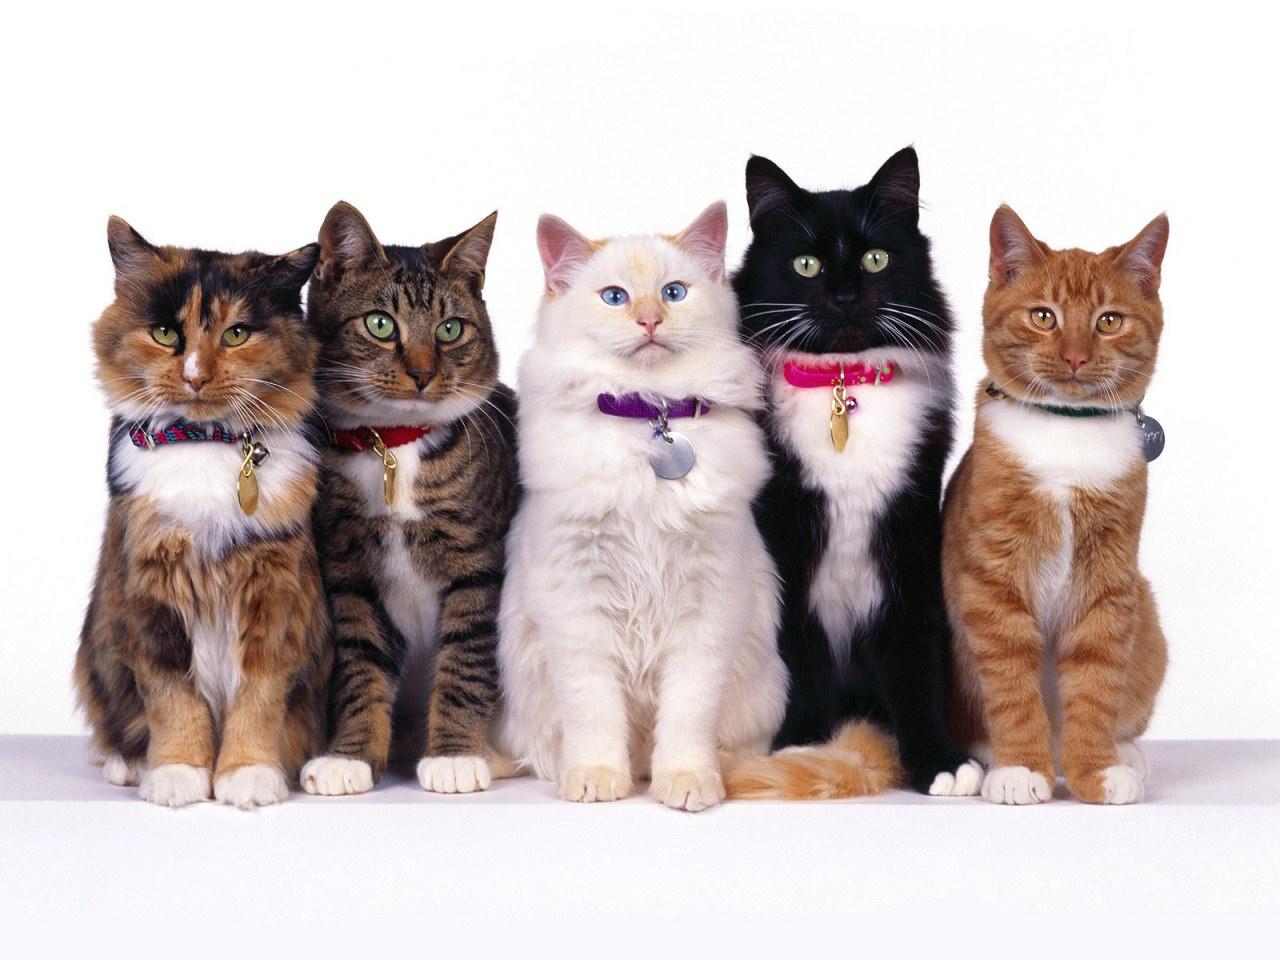 Fancy Felines Lined Up In Their Sunday Best